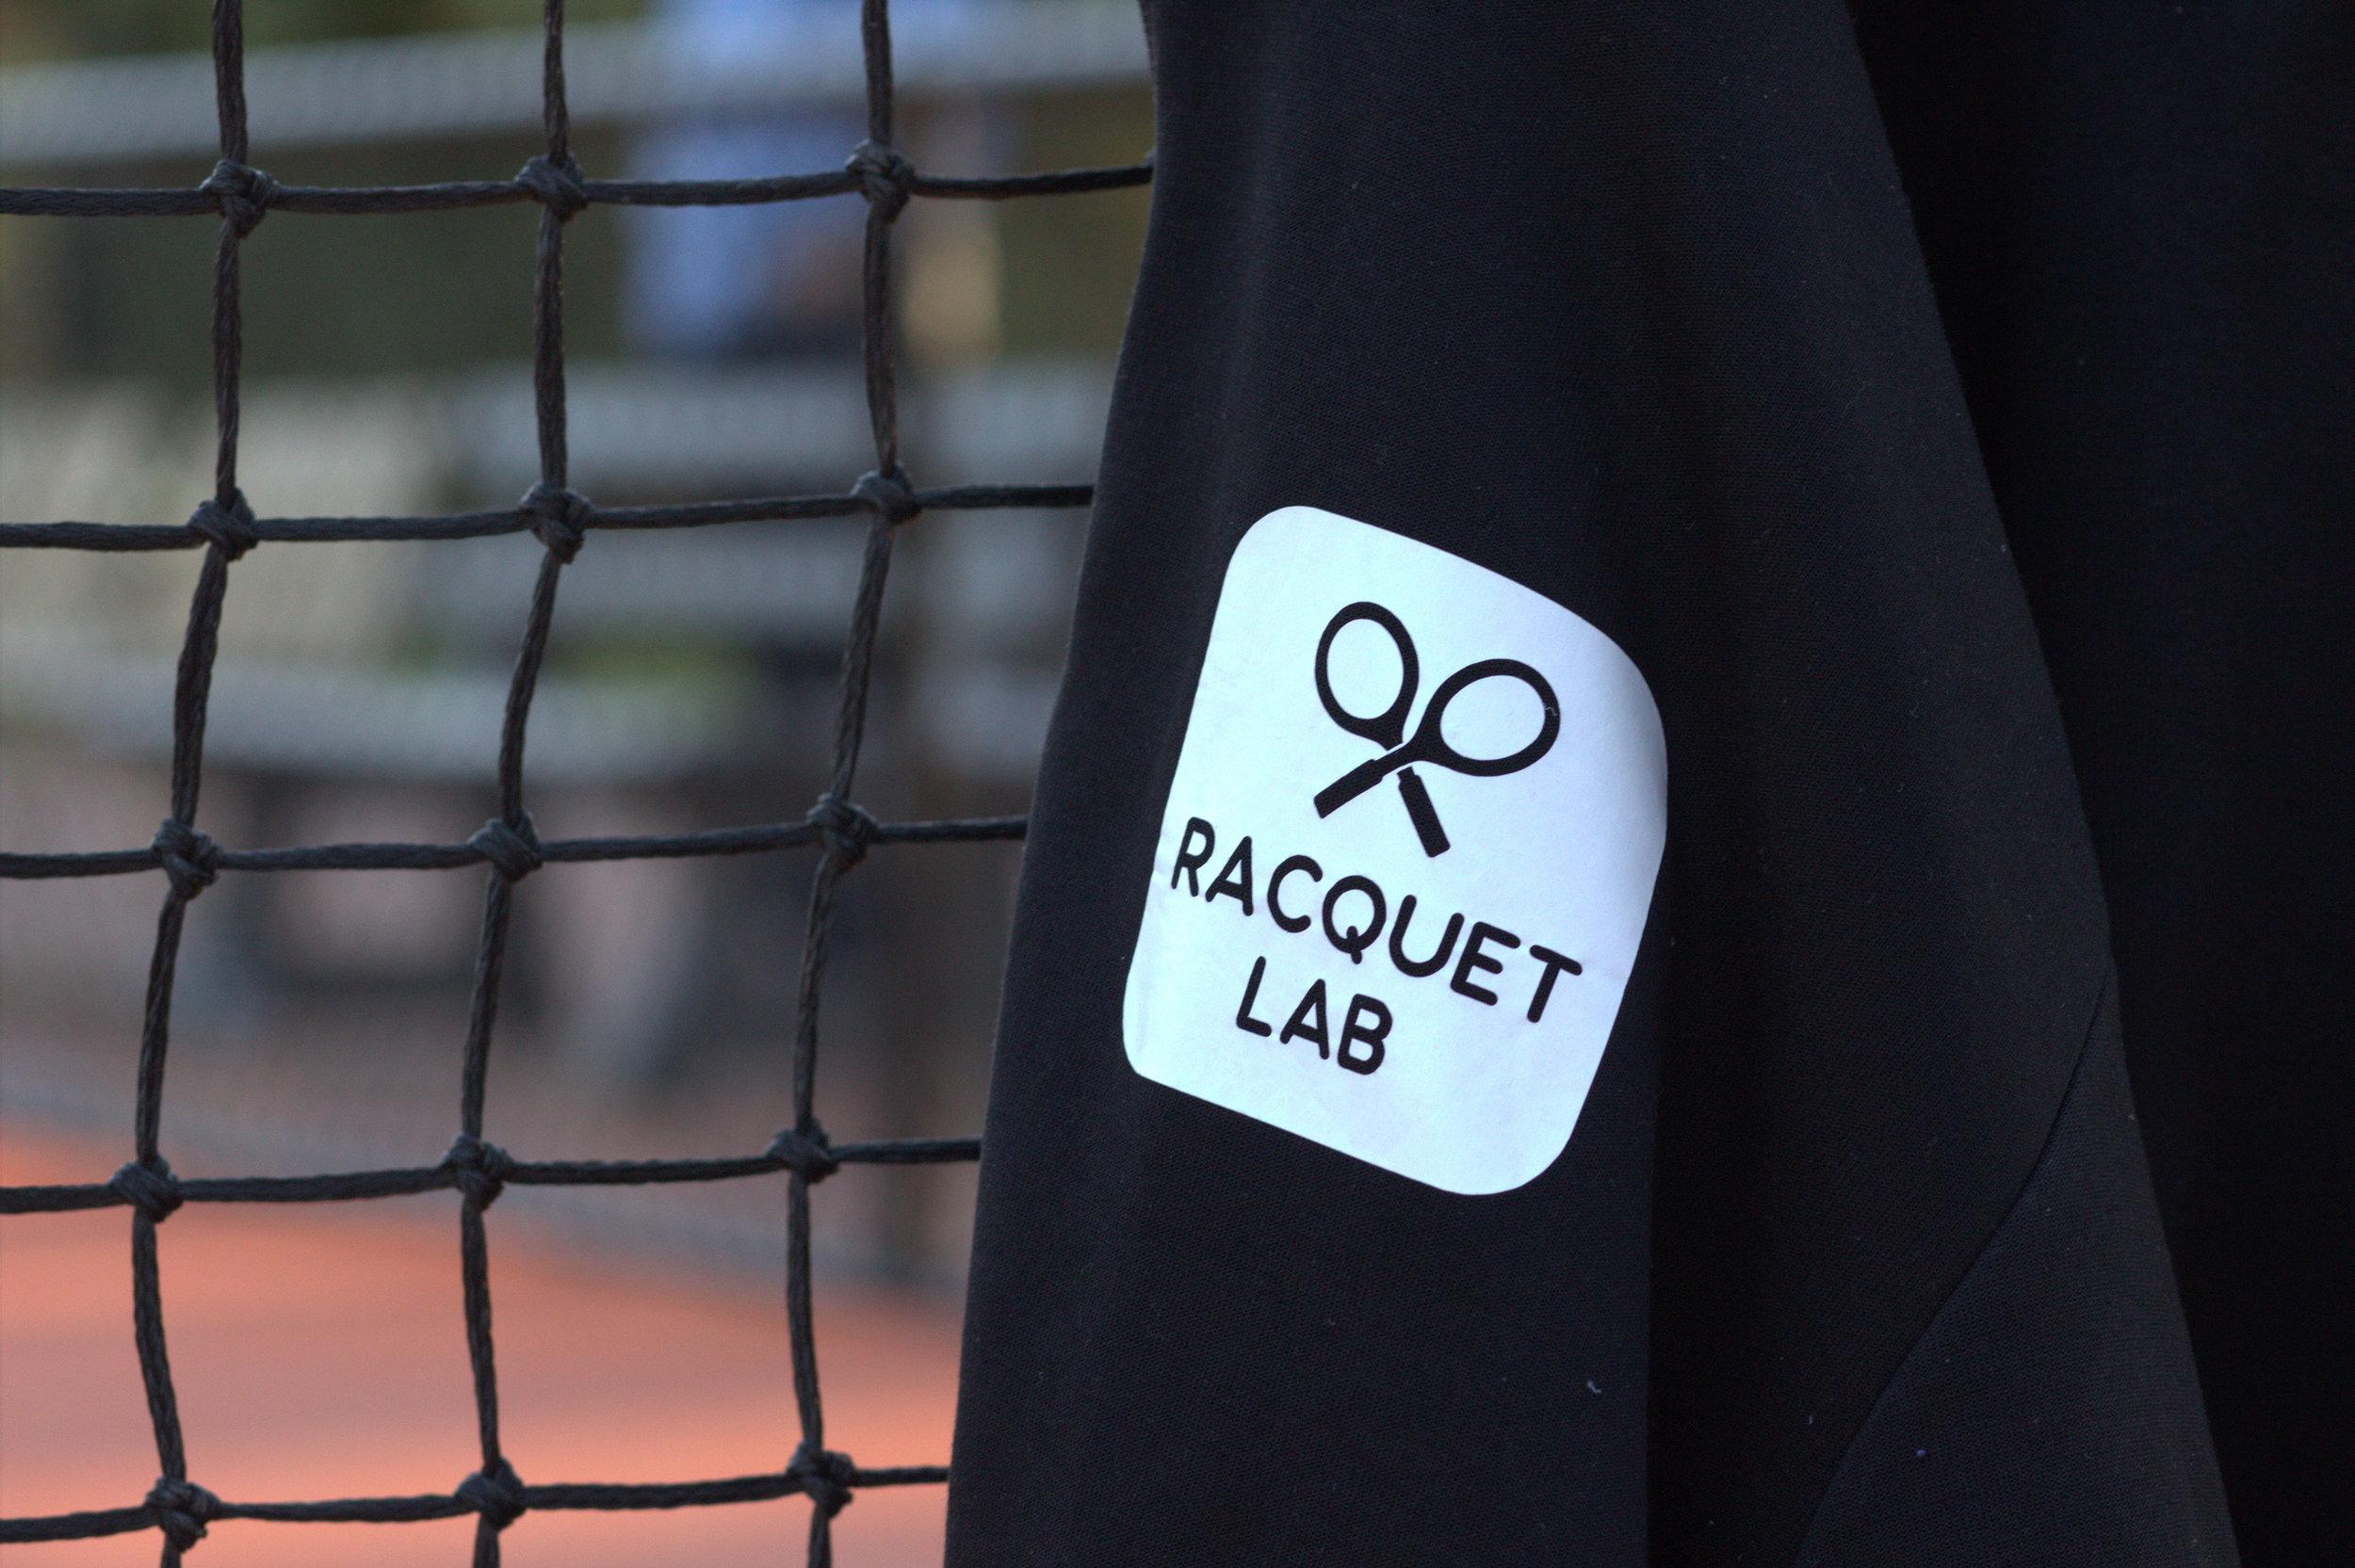 racquet lab.jpg